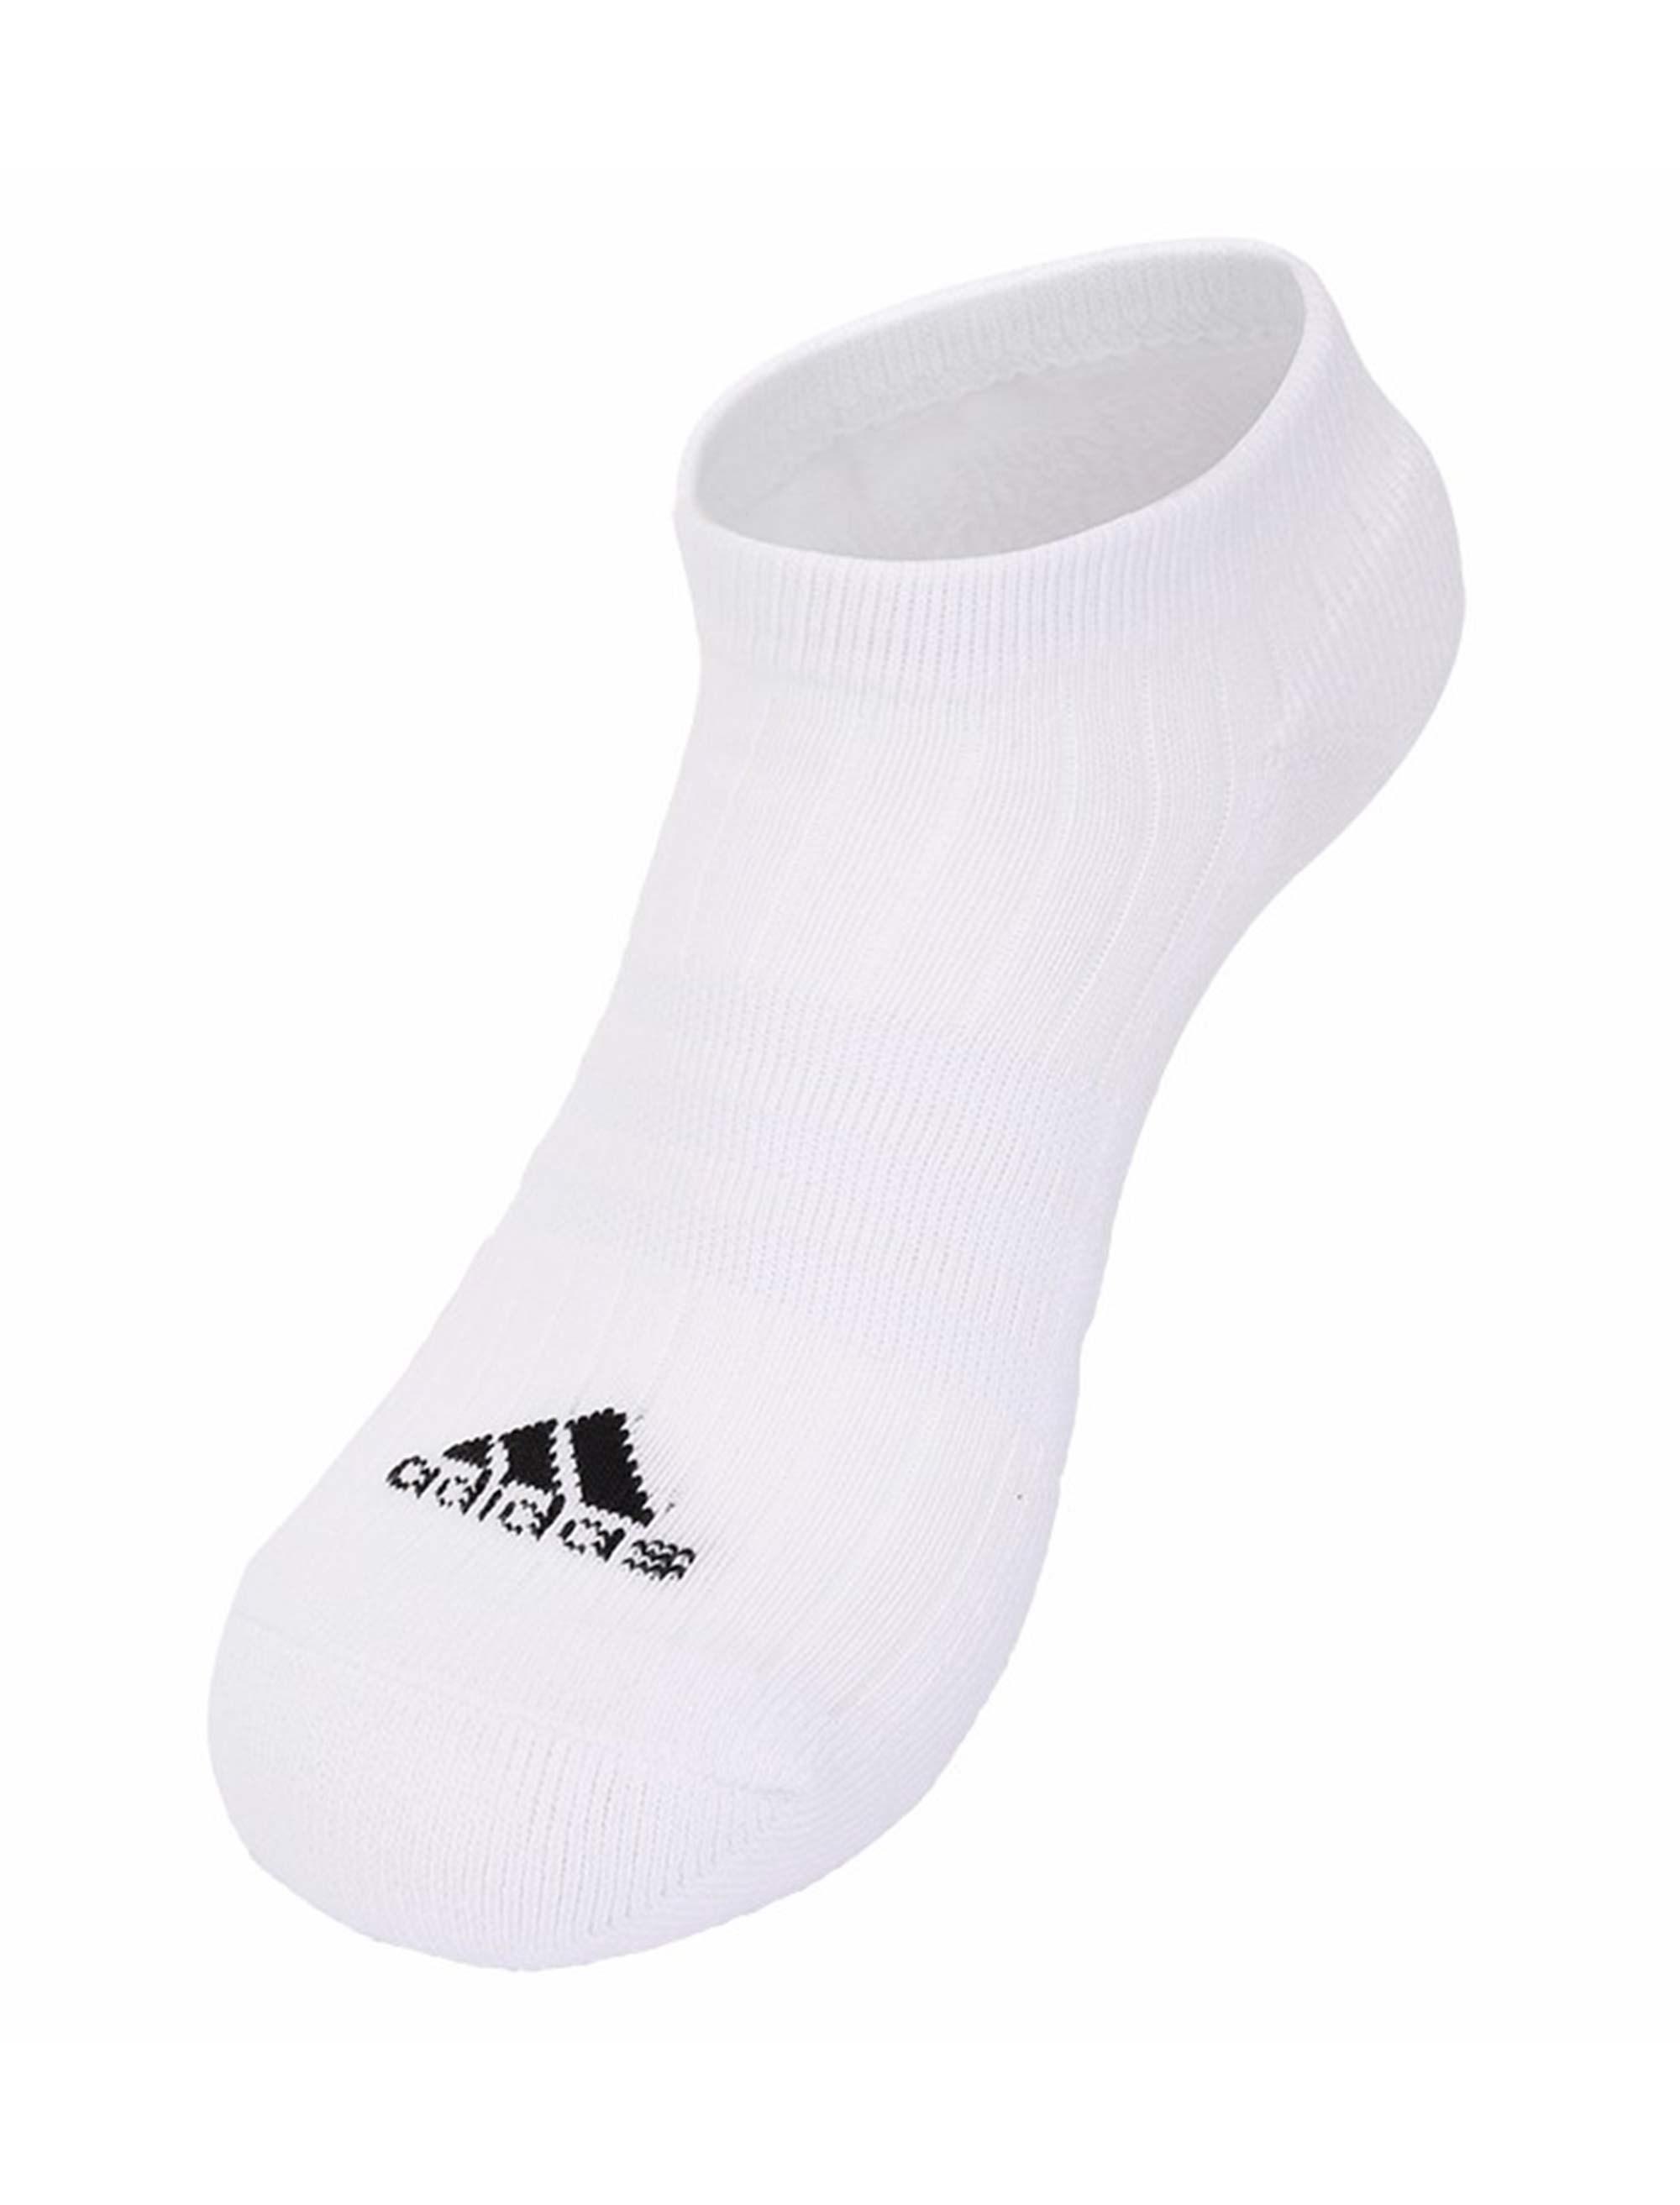 جوراب نخی بدون ساق بزرگسال بسته 3 عددی - آدیداس - طوسي/مشکي/سفيد - 2